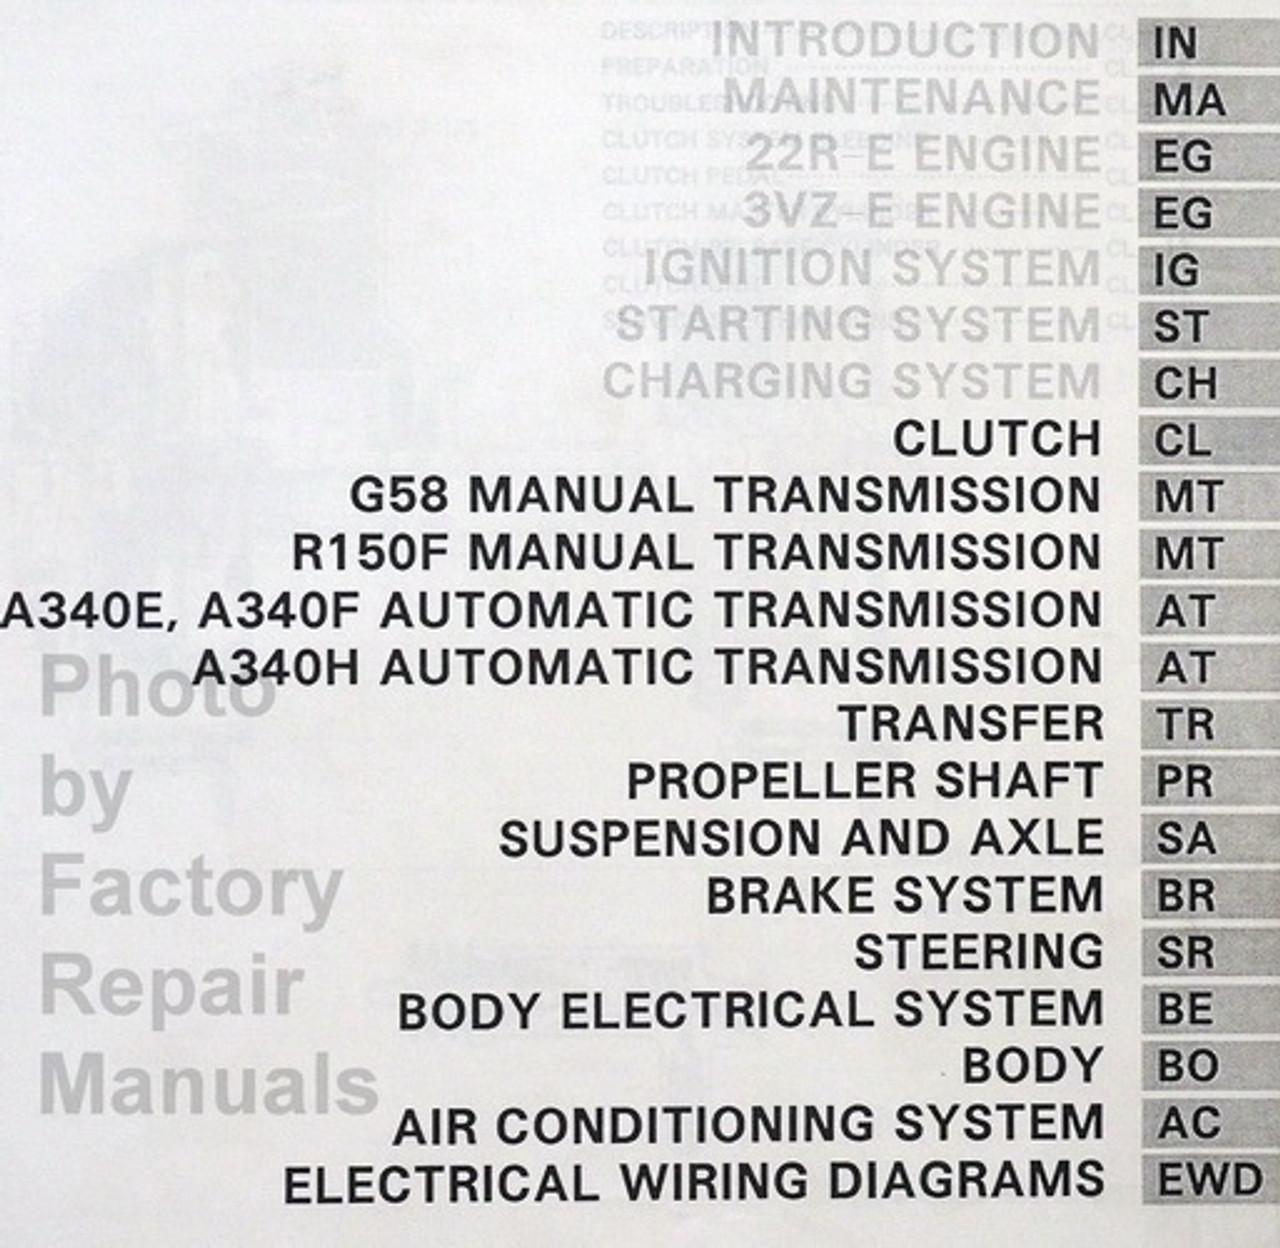 1994 Toyota 4Runner Factory Service Manual Set Original Shop Repair - Factory  Repair Manuals | 1994 Toyota 4runner Wiring Diagram Manual Original |  | Factory Repair Manuals